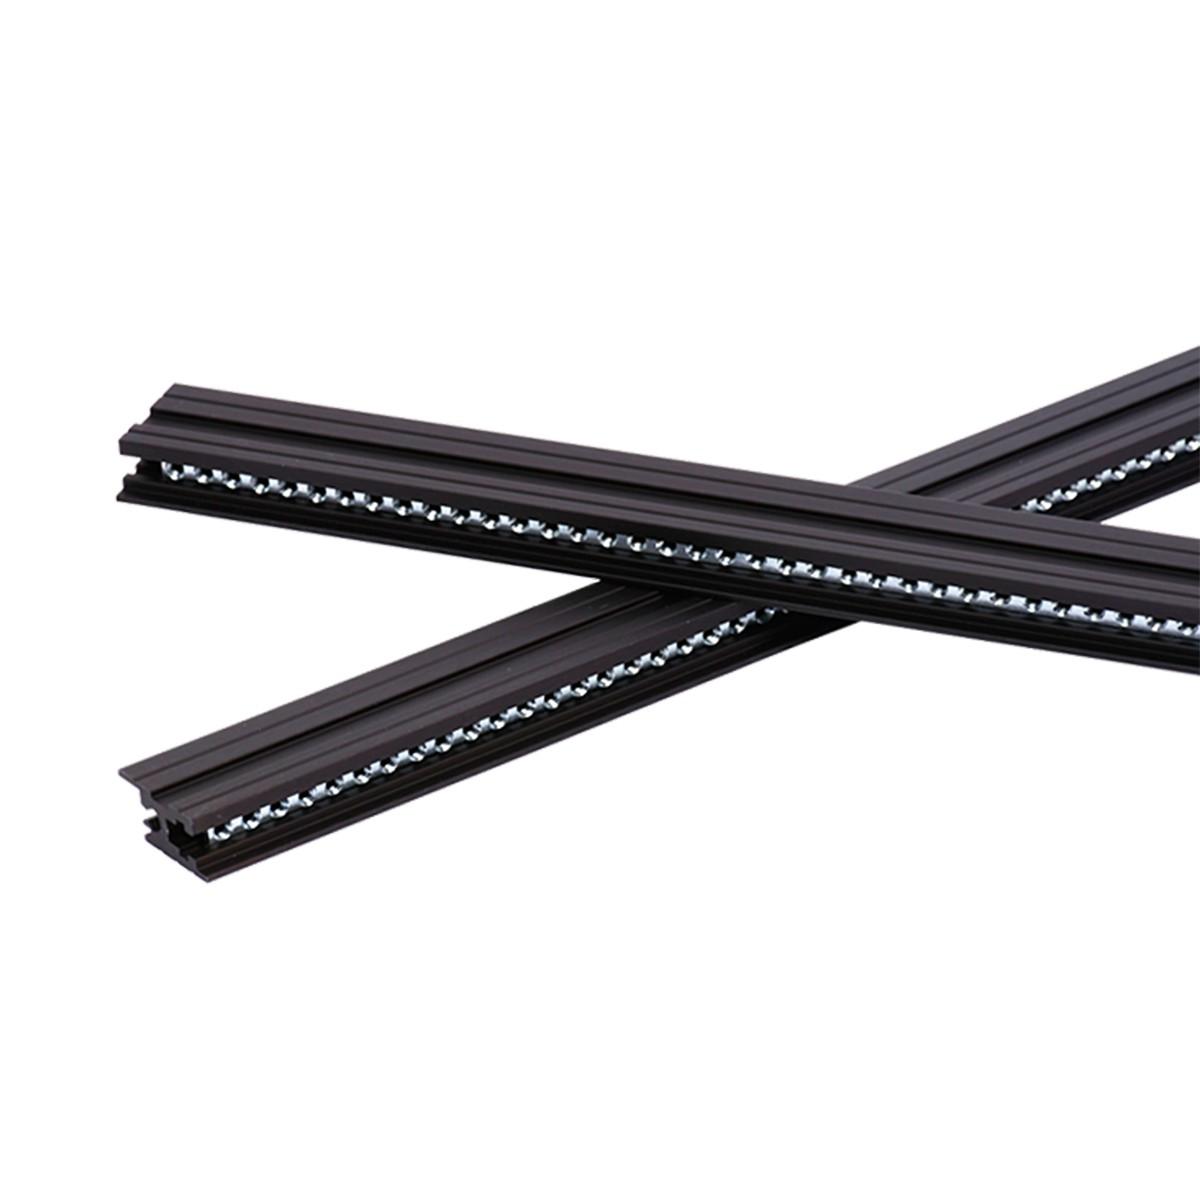 Tiptop Audio Z-Rails 126HP Eurorack Mounting Rails – Black (Pair)